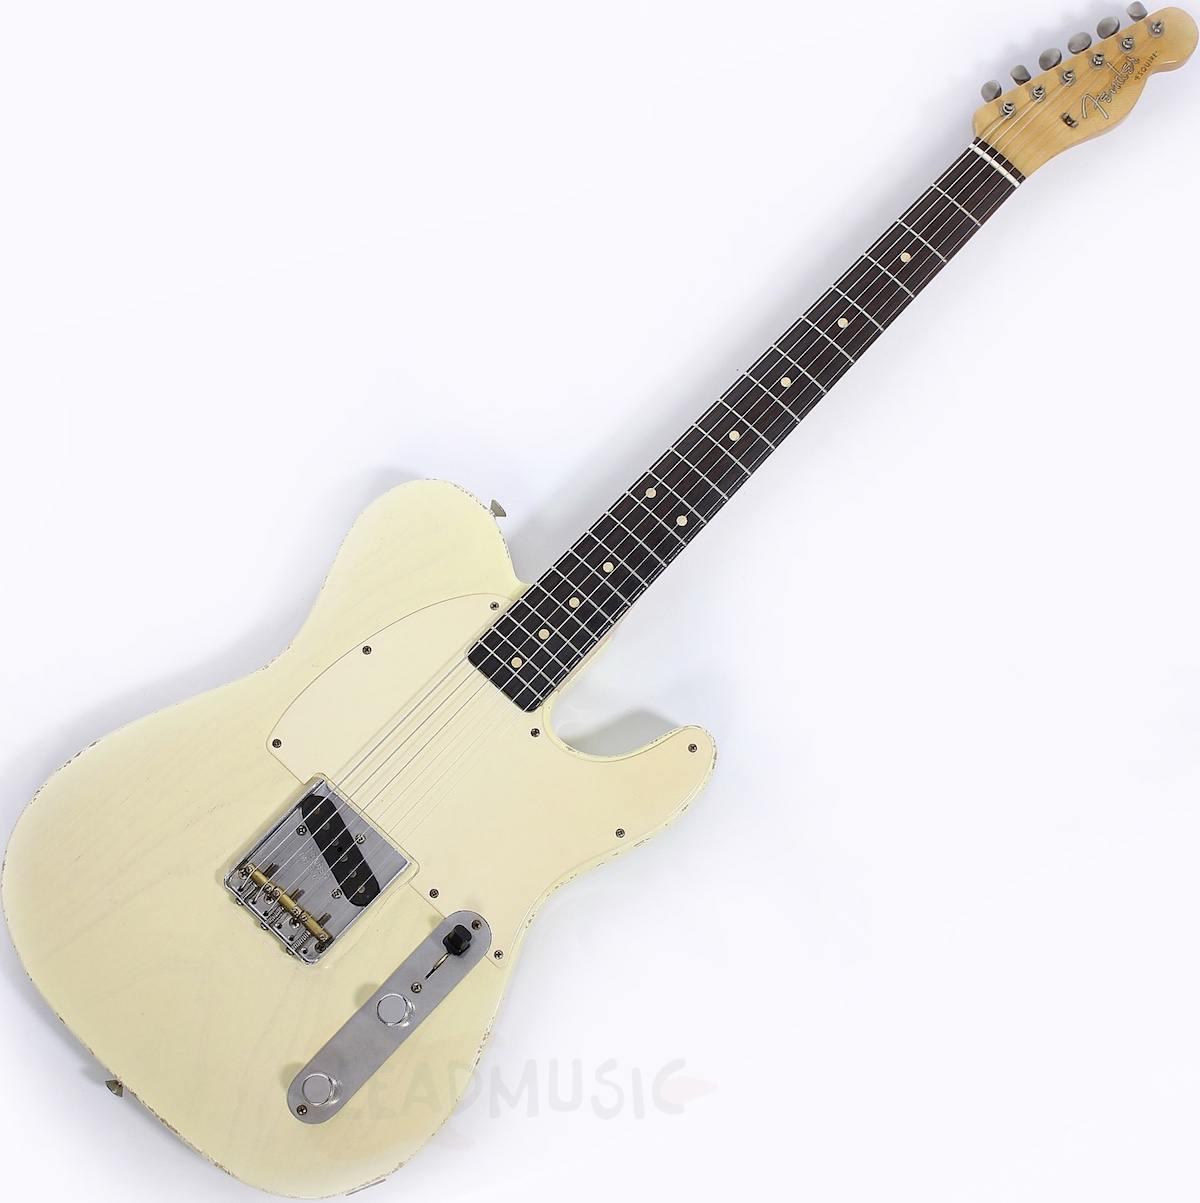 2005 Fender John English Masterbuilt Esquire Proto